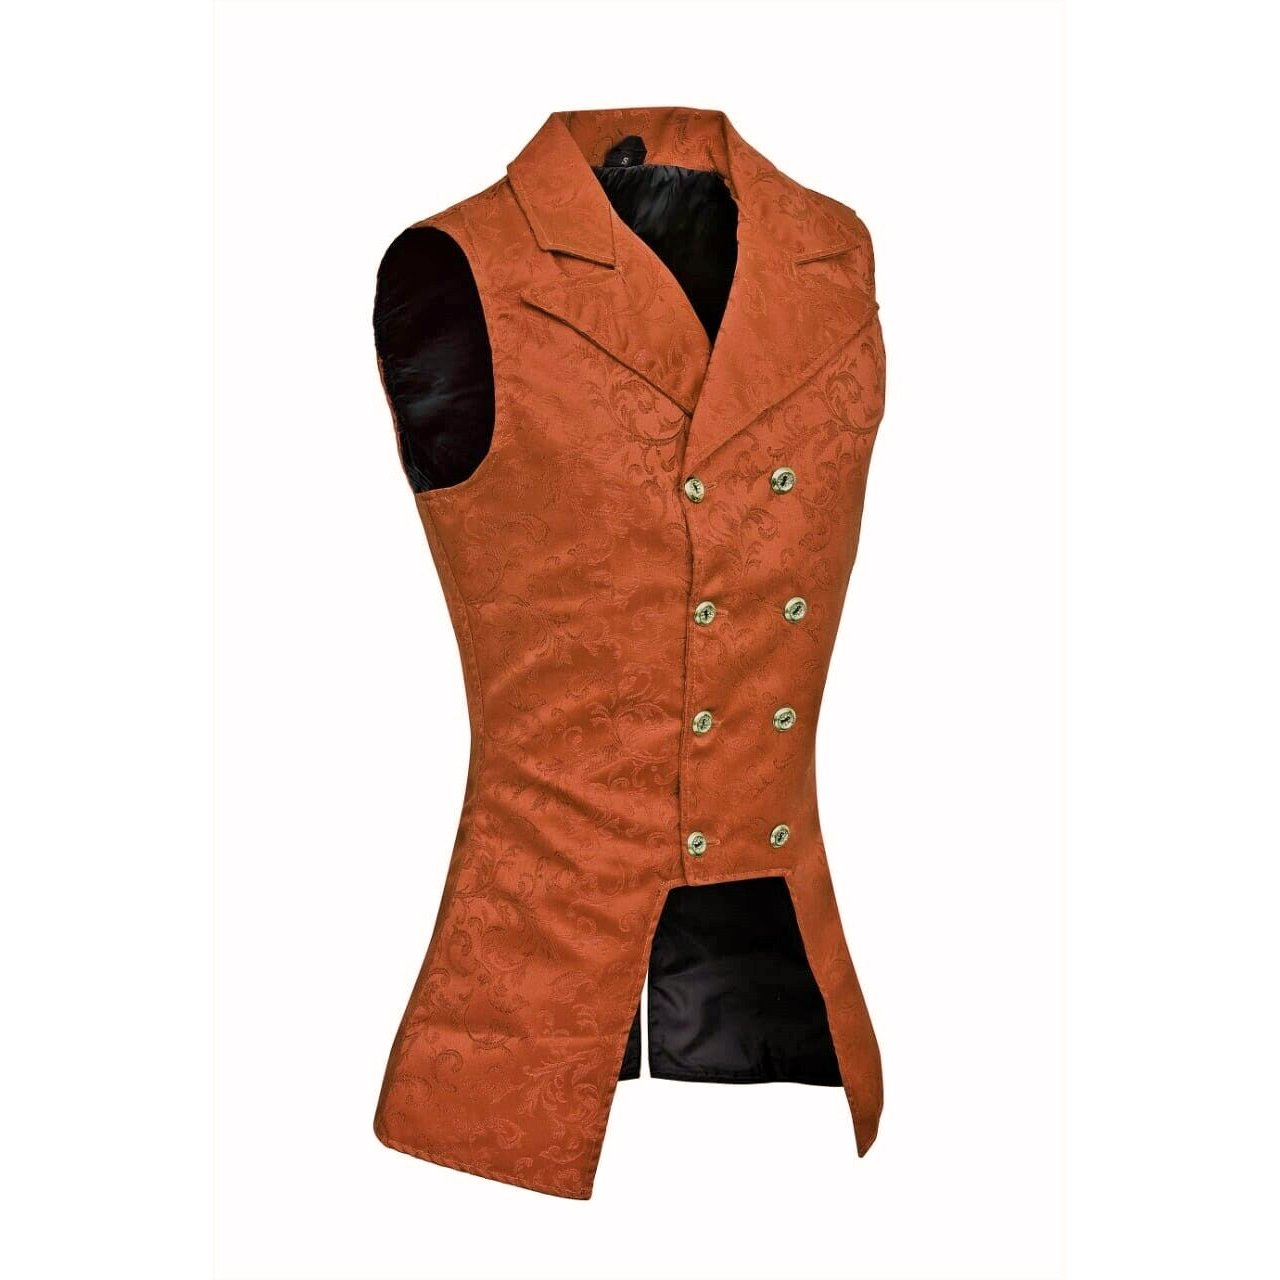 DARKROCK Brown Brocade Double Breasted GOVERNOR Vest Waistcoat (side)